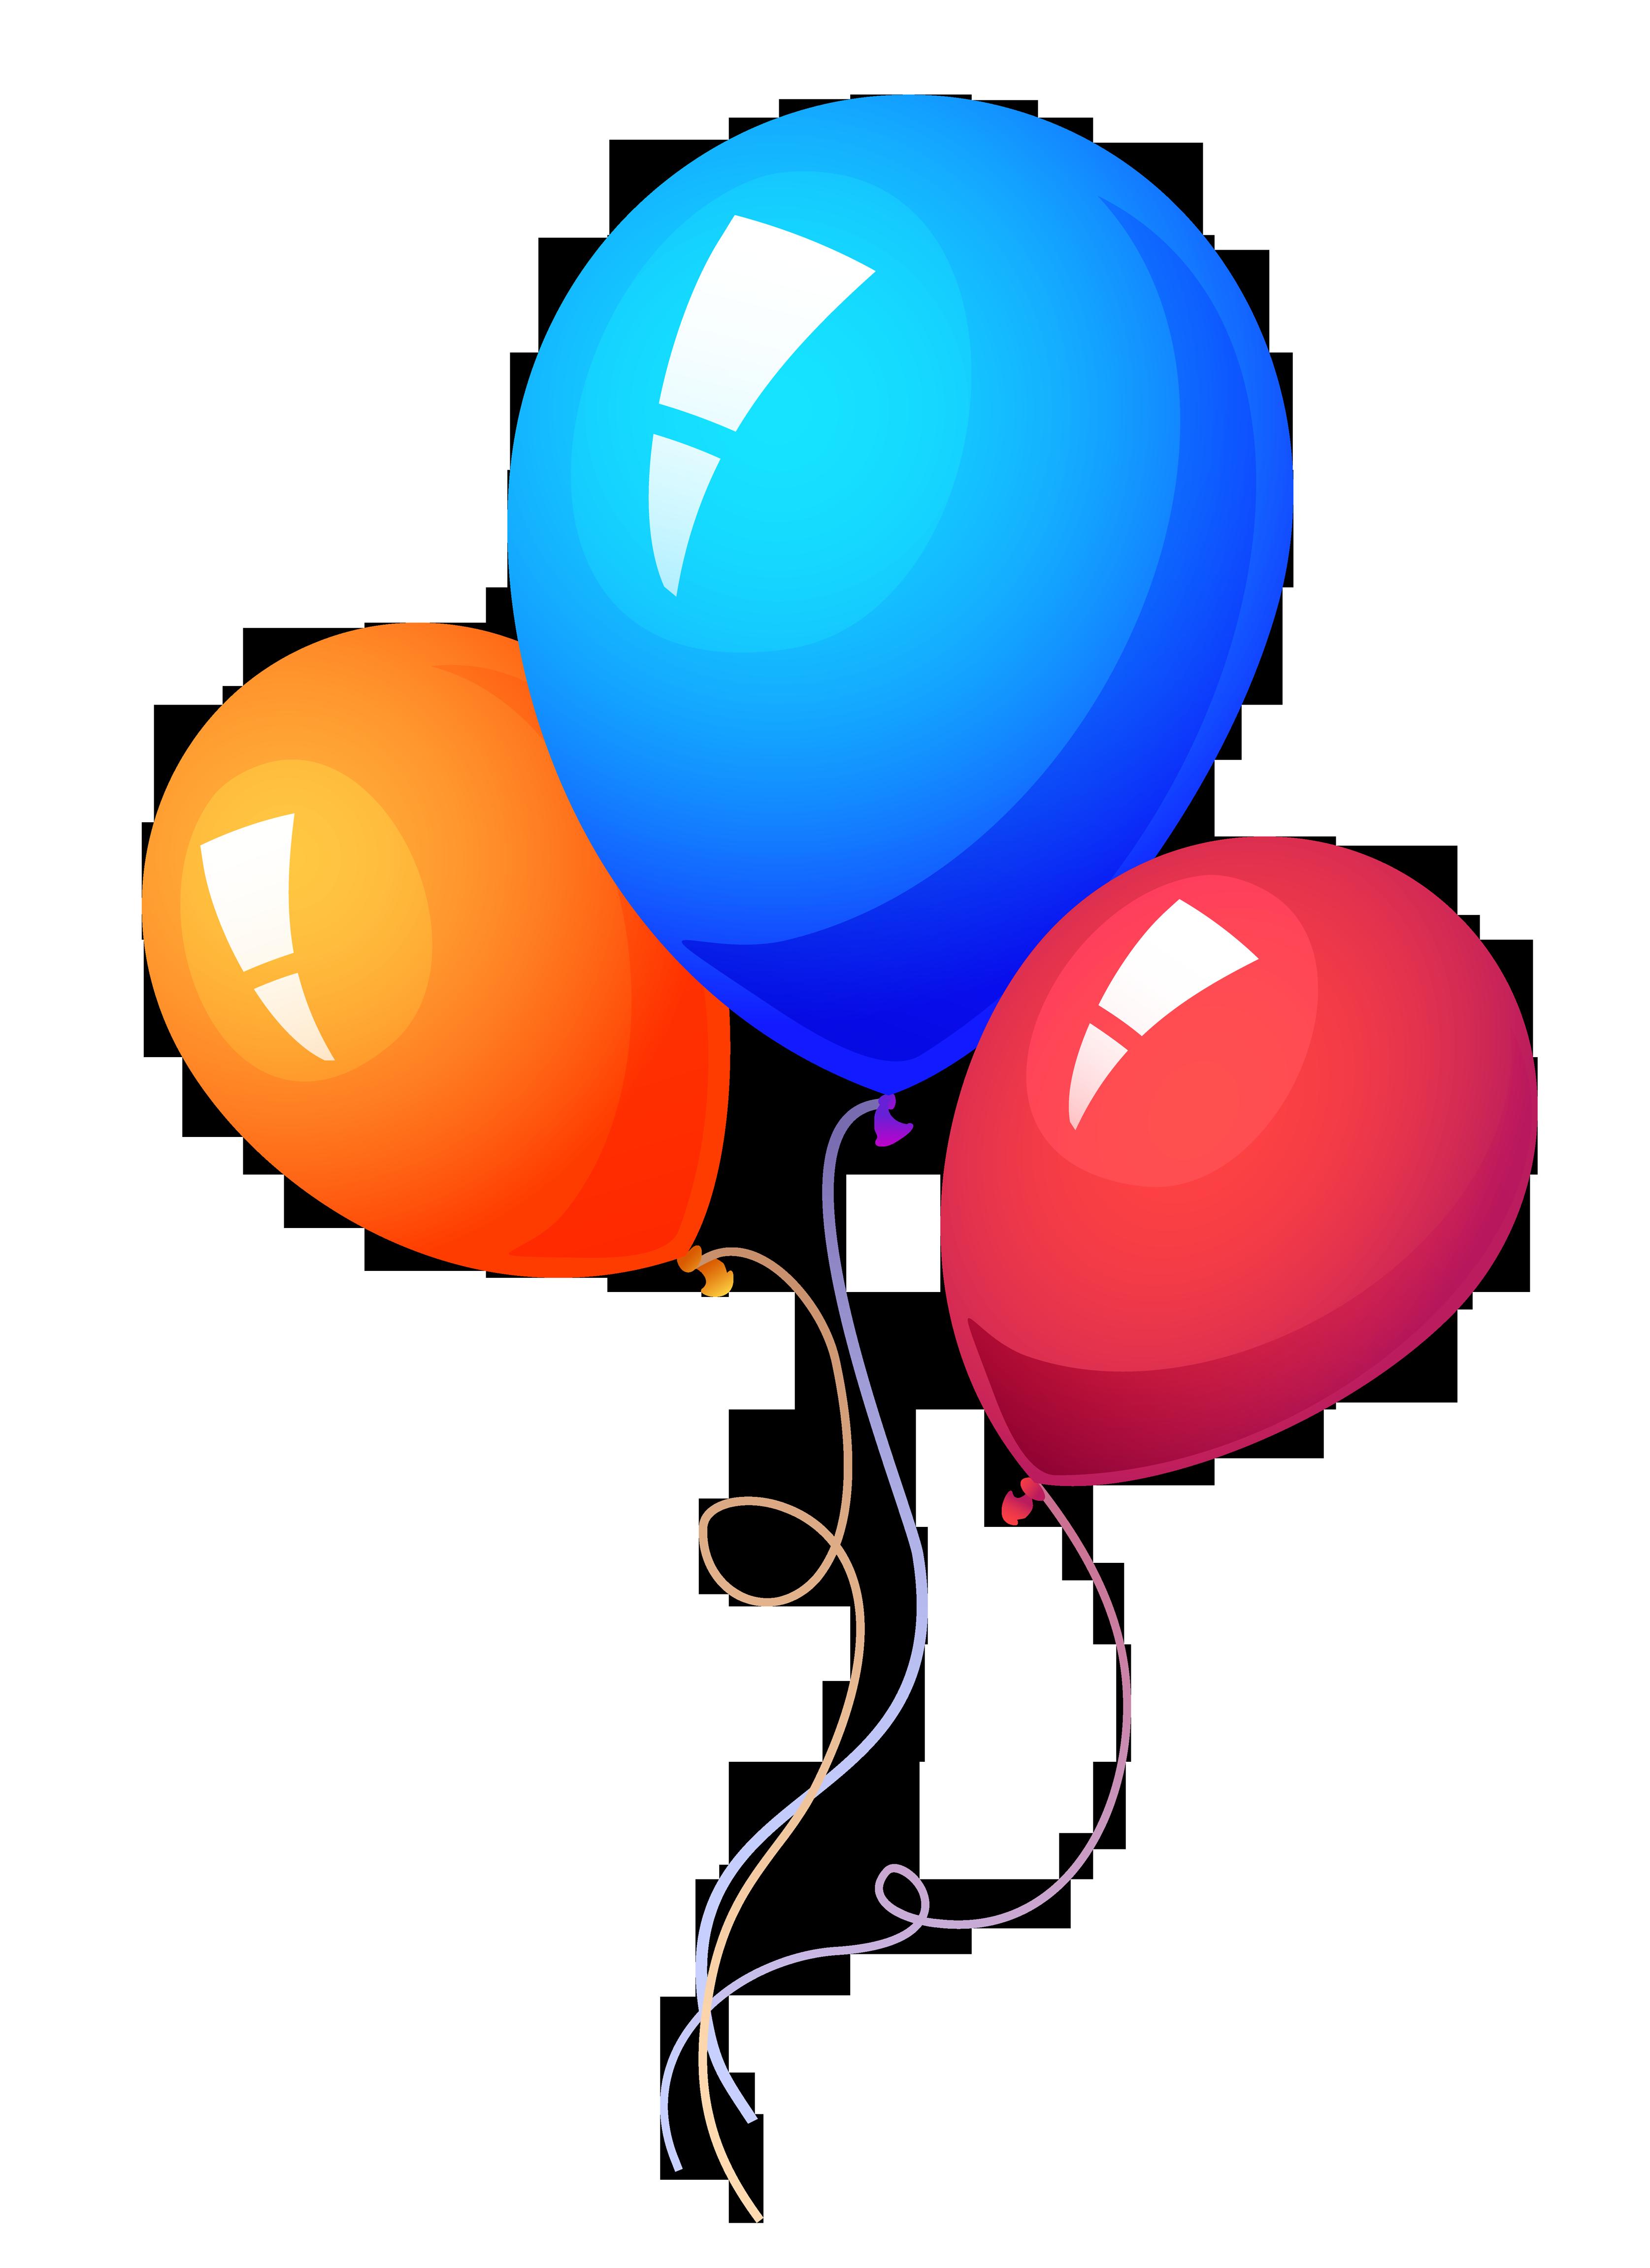 Hdpng - Balloon, Transparent background PNG HD thumbnail